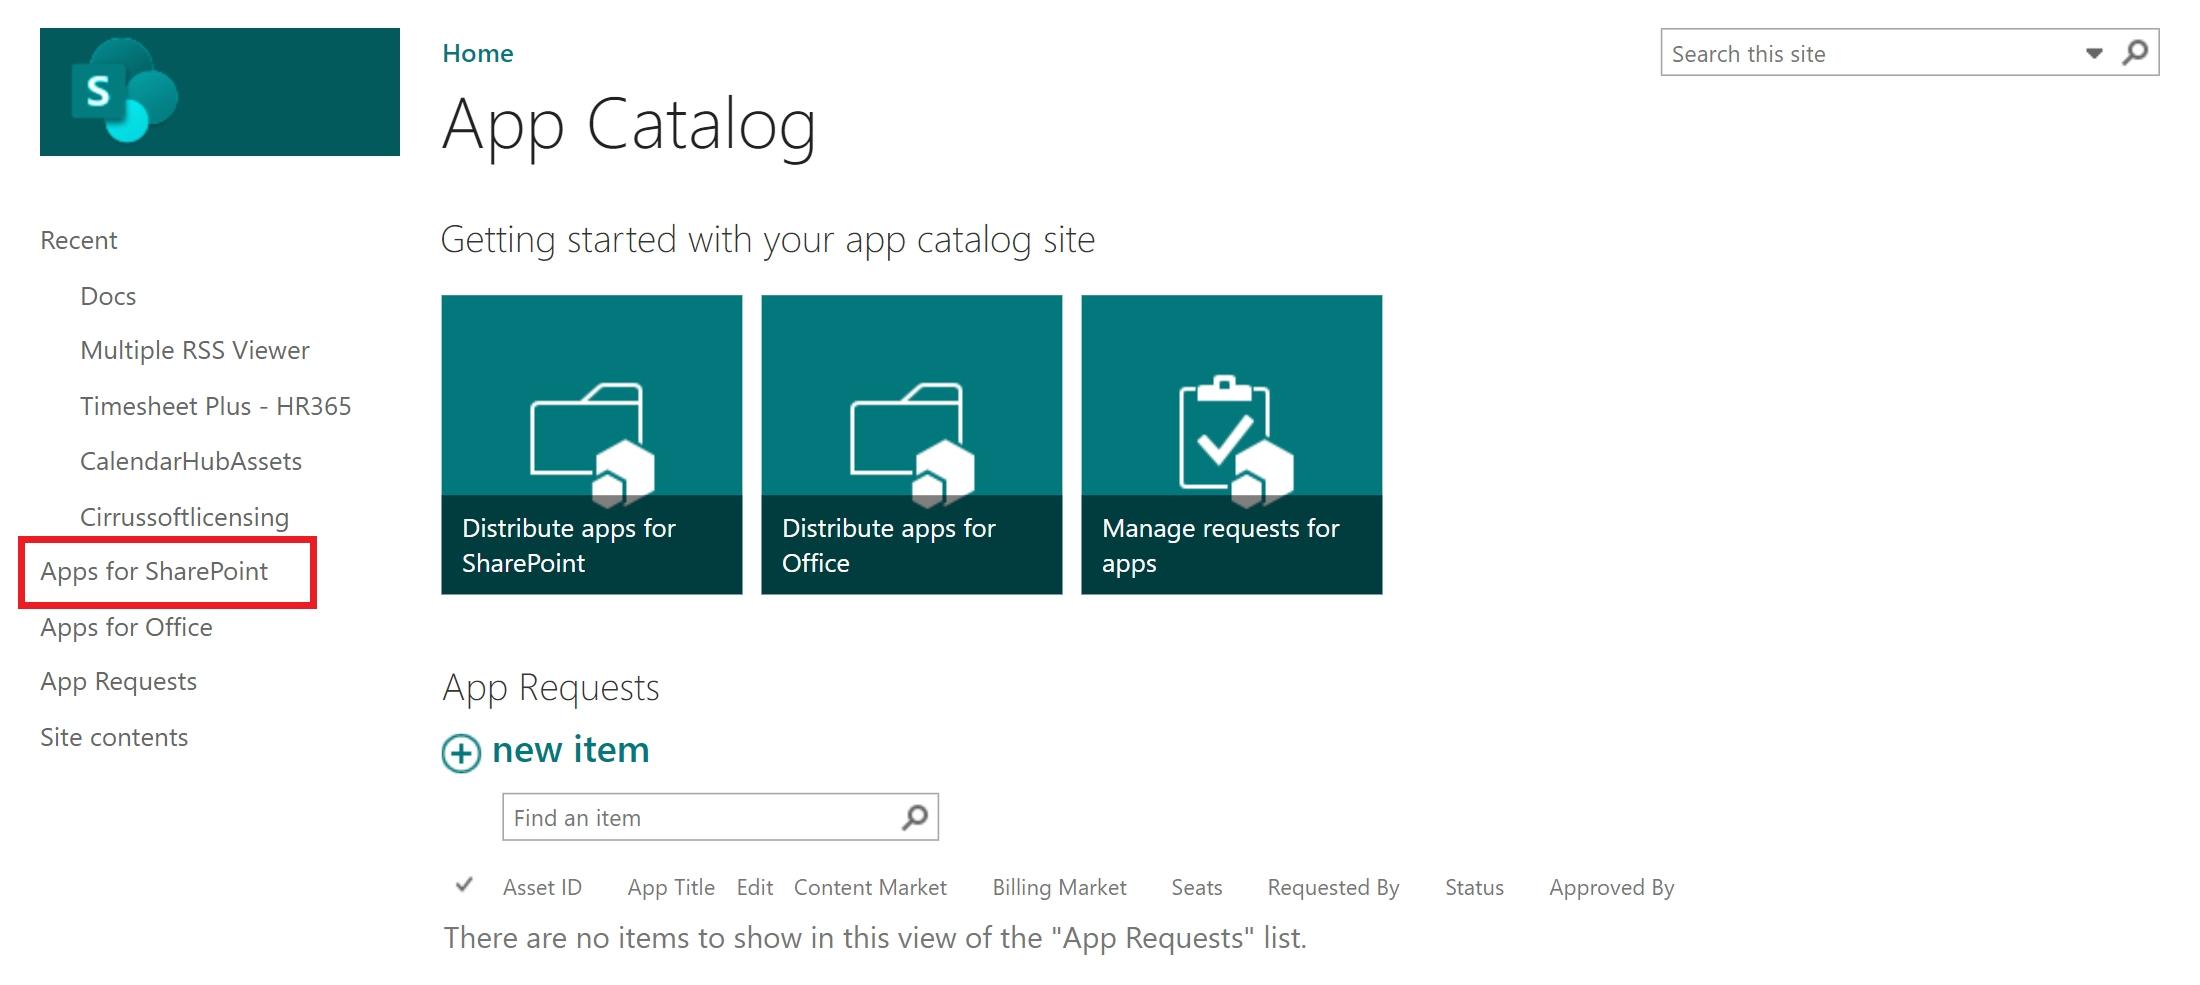 deploy_to_app_catalog